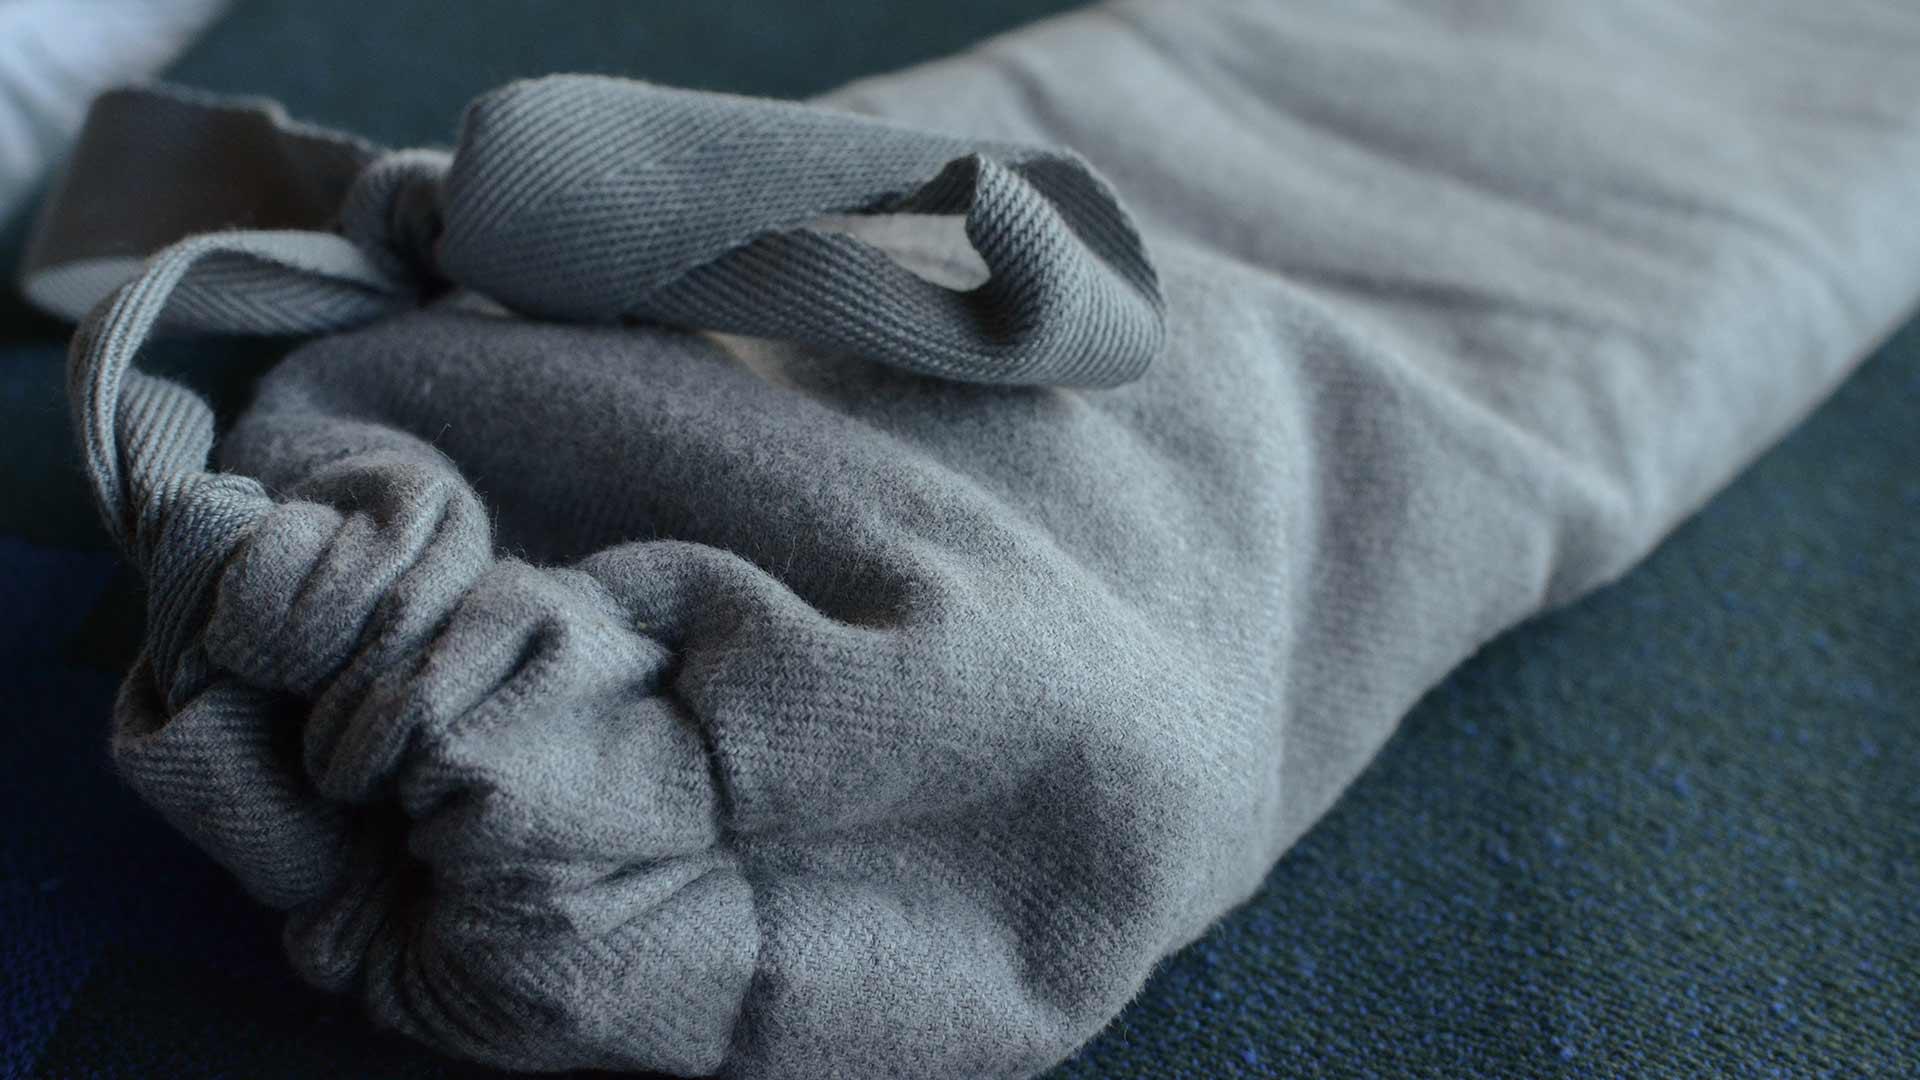 YuYu-hotwater-bottle-grey-cotton